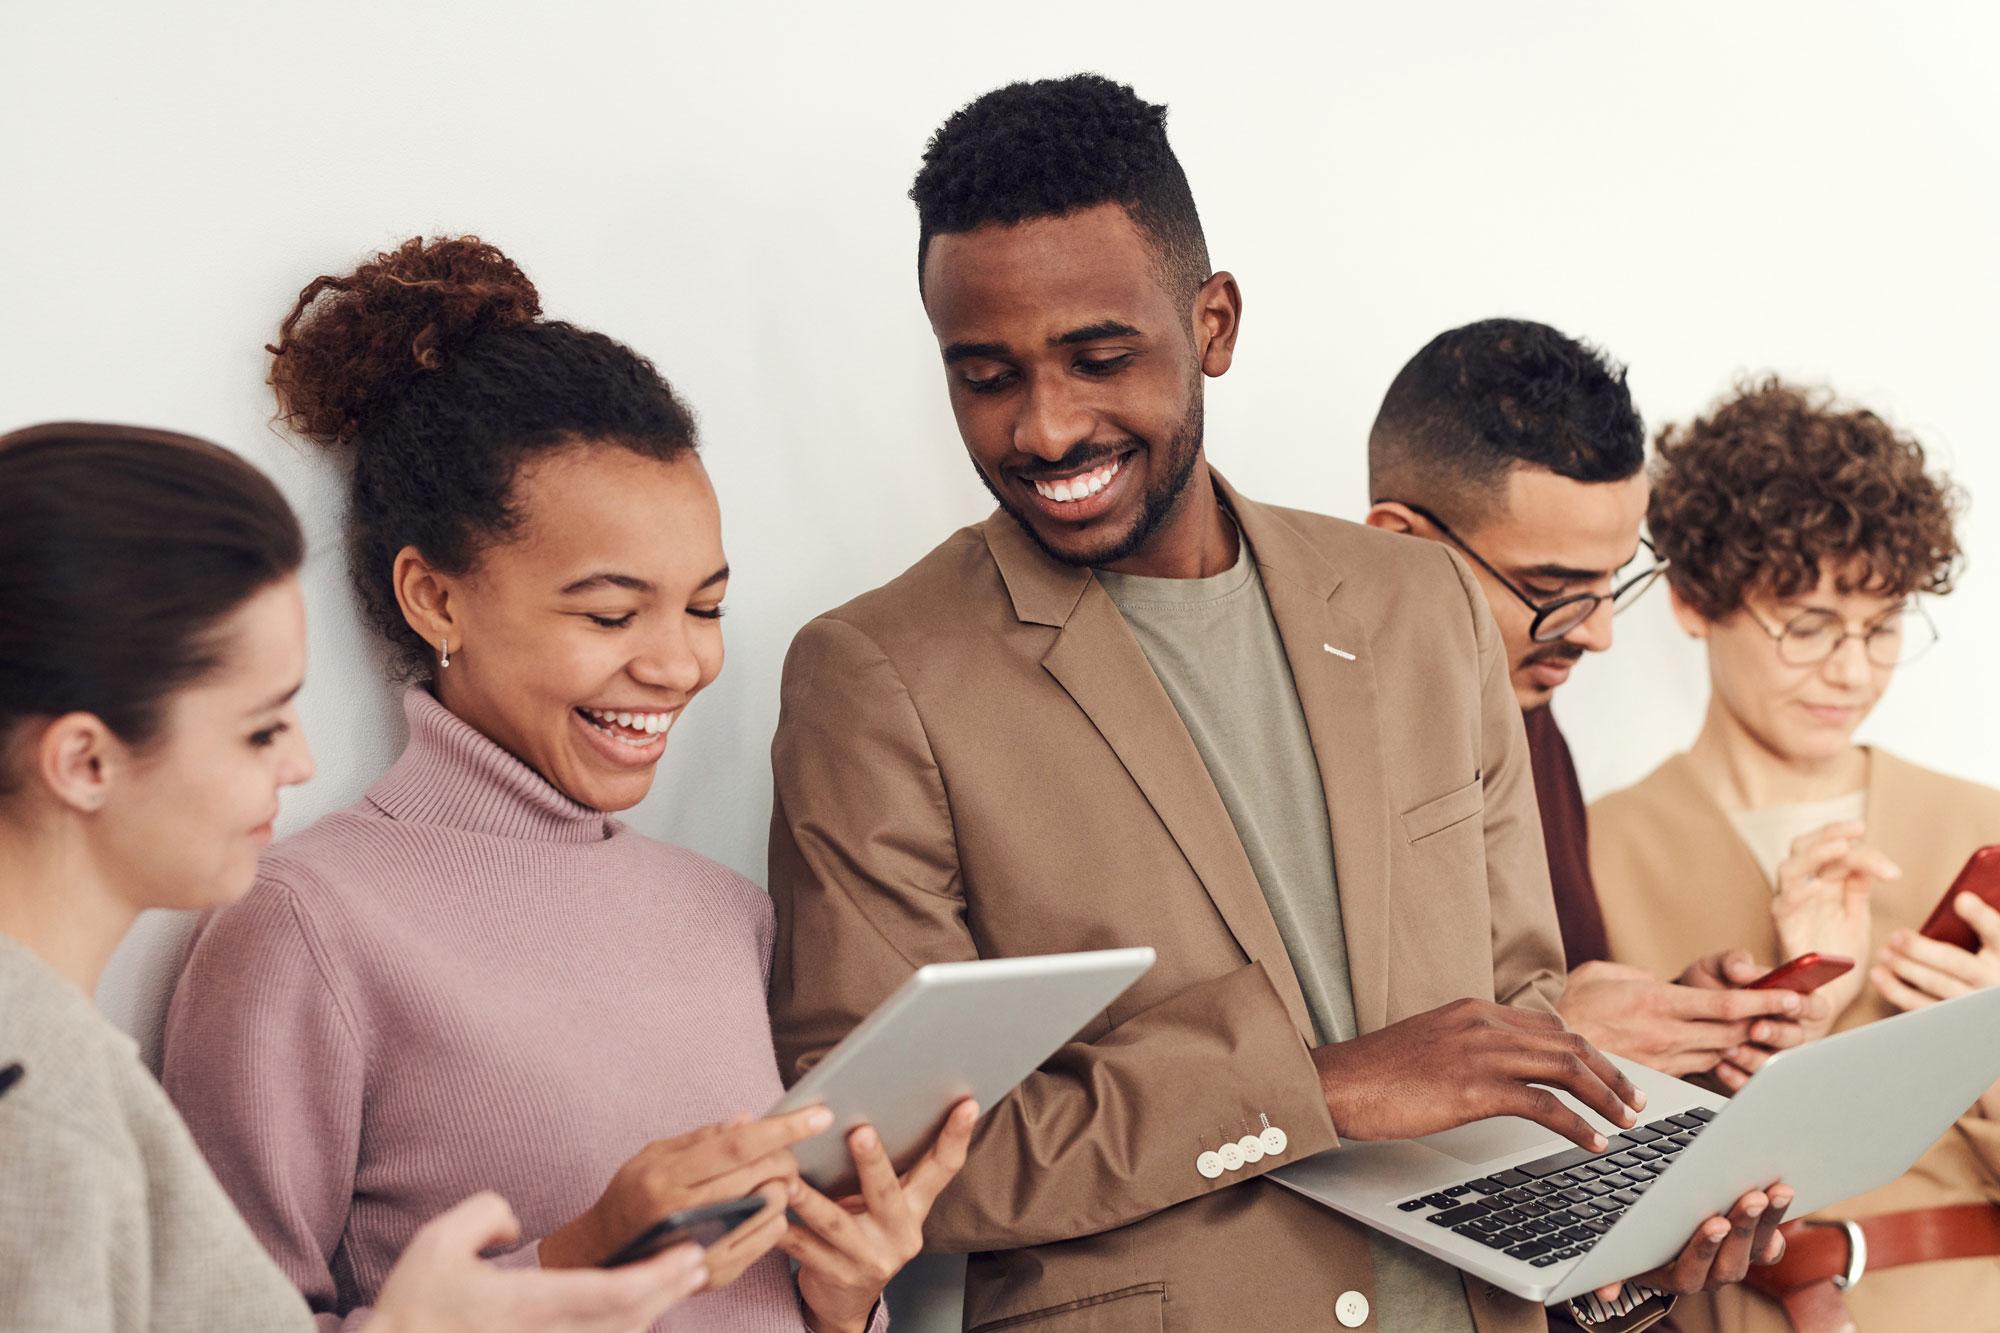 people-using-tech-smiling